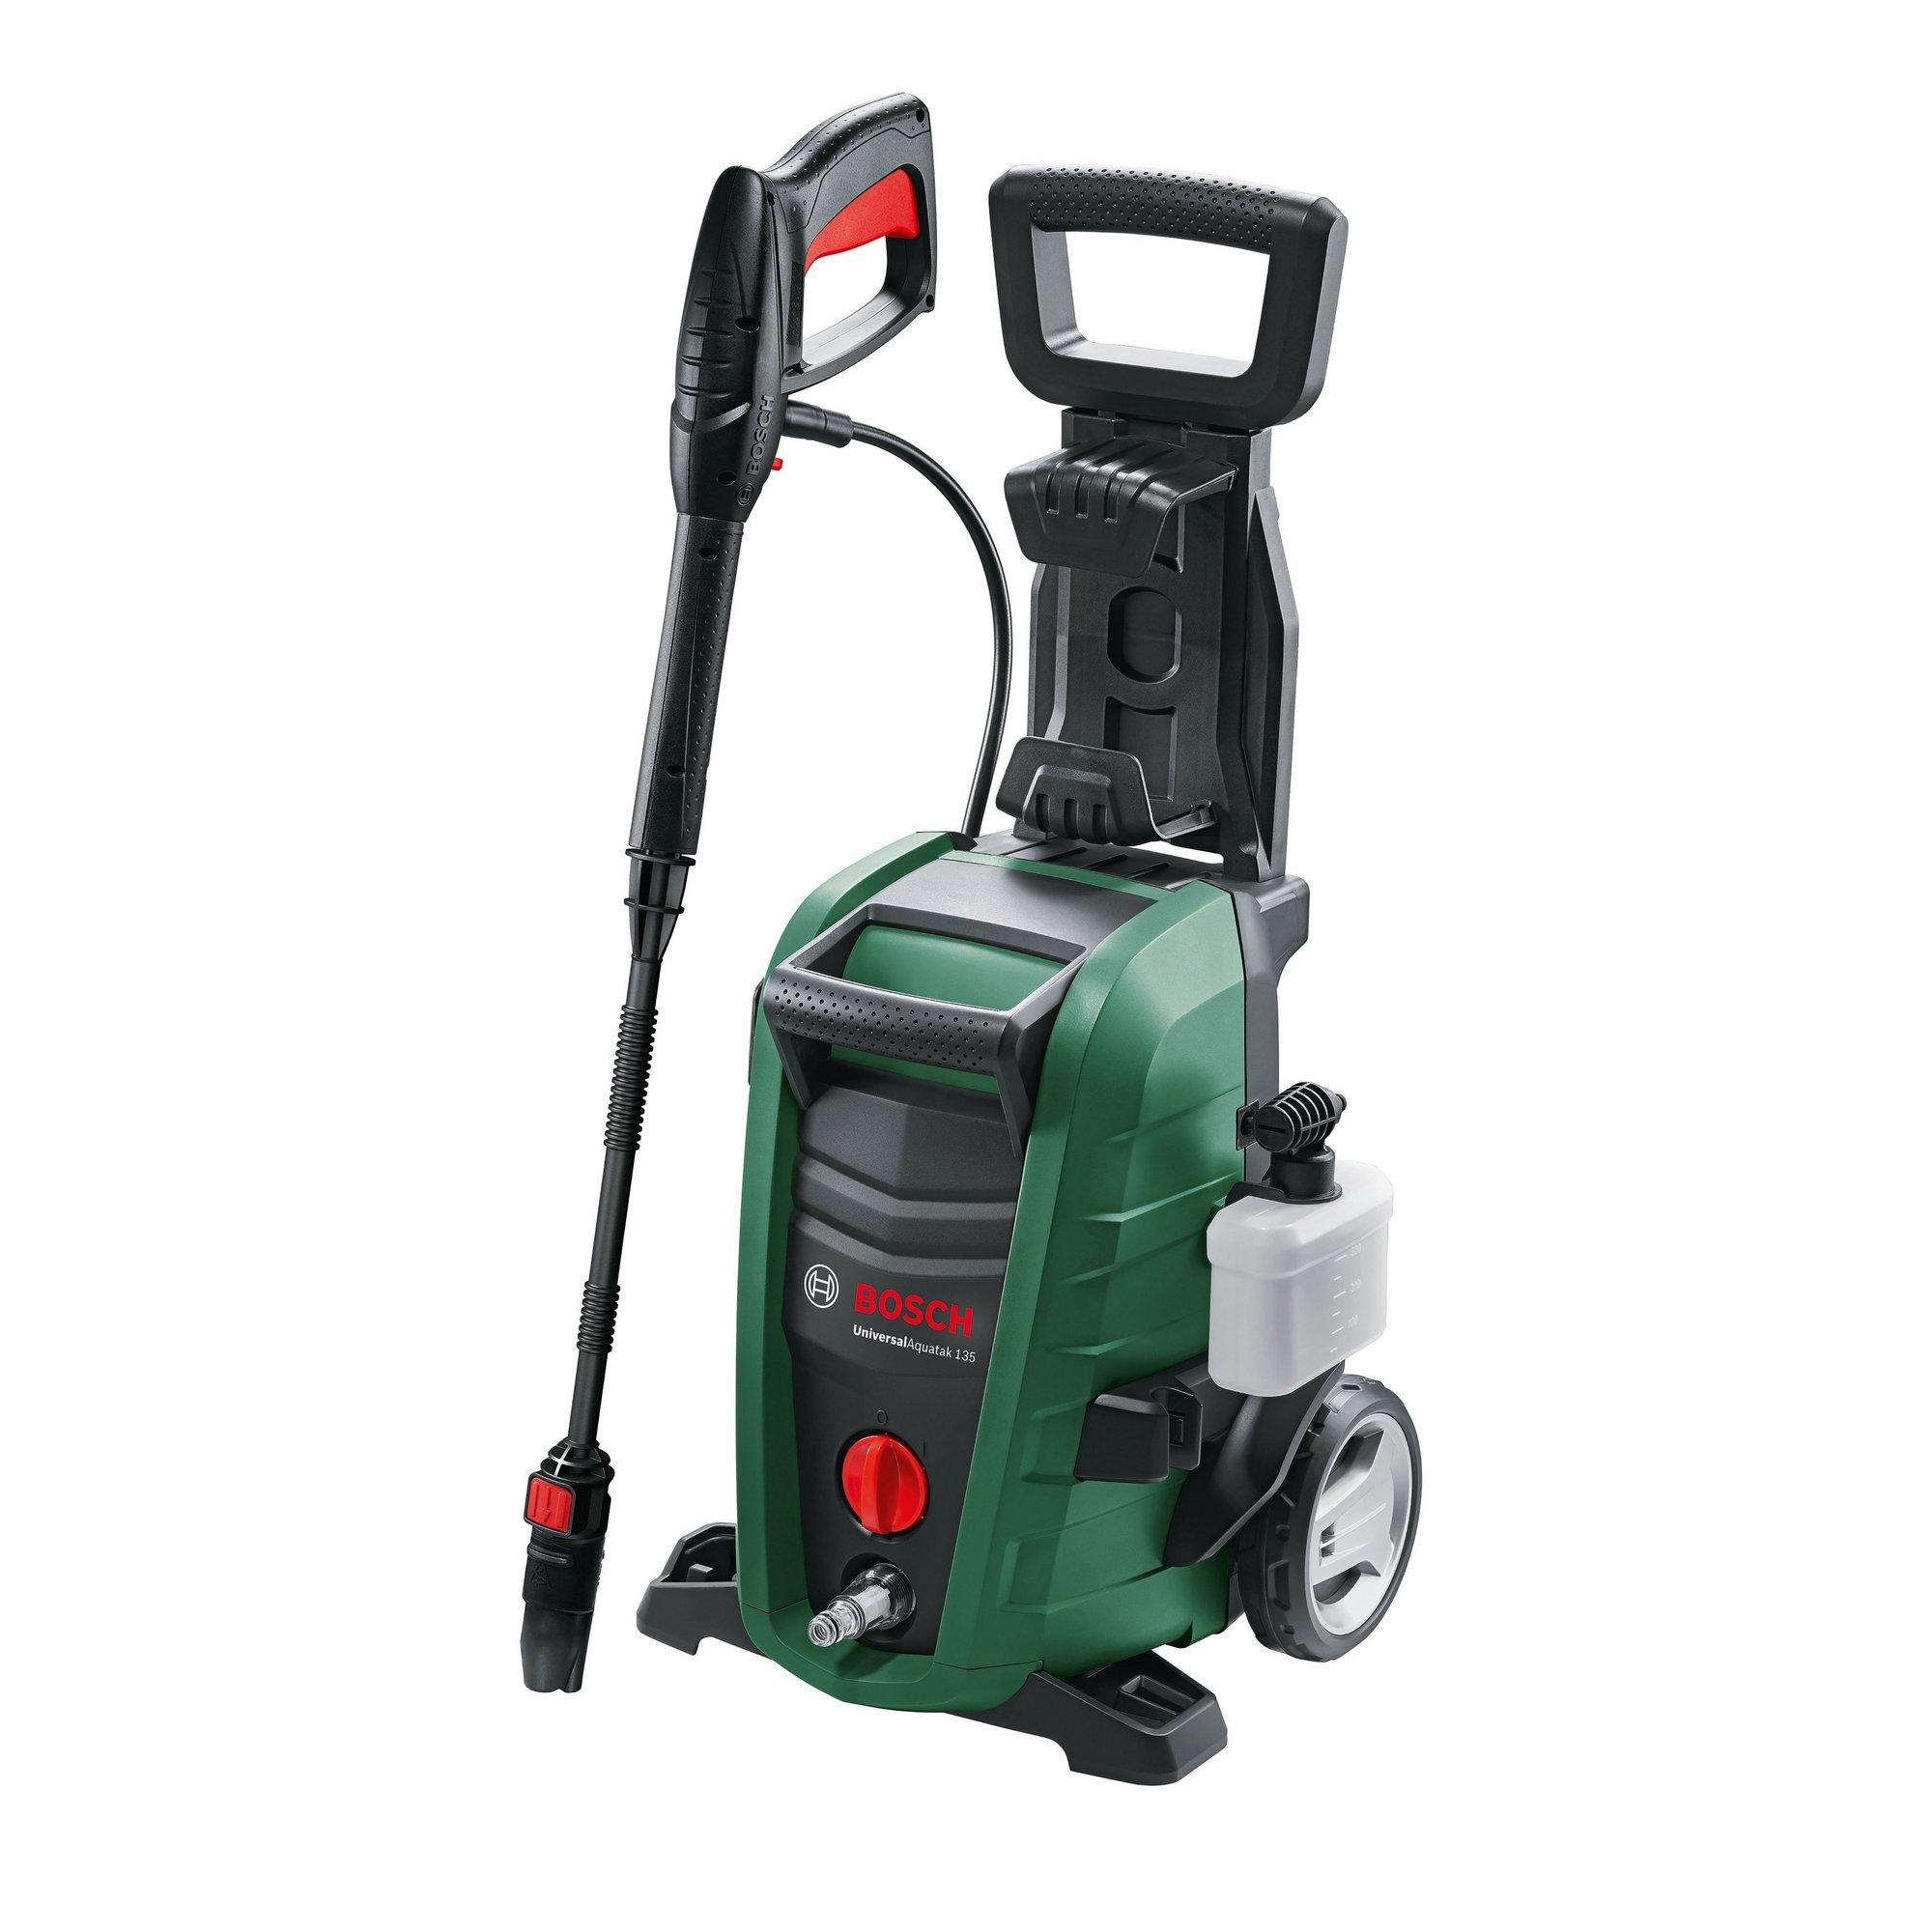 Image of Bosch Universal Aquatak 135 Electric Pressure Washer